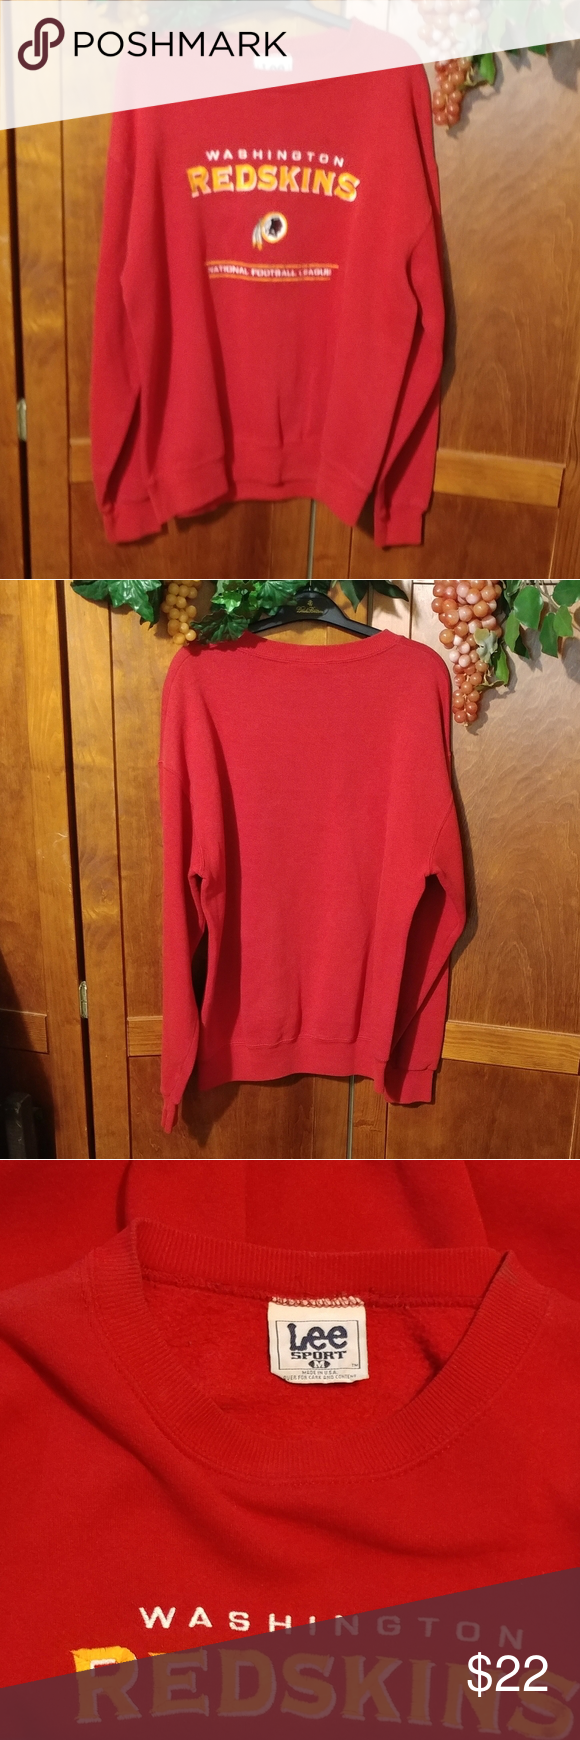 Vintage Redskins Sweatshirt Size M In 2020 Sweatshirts Lee Shirt